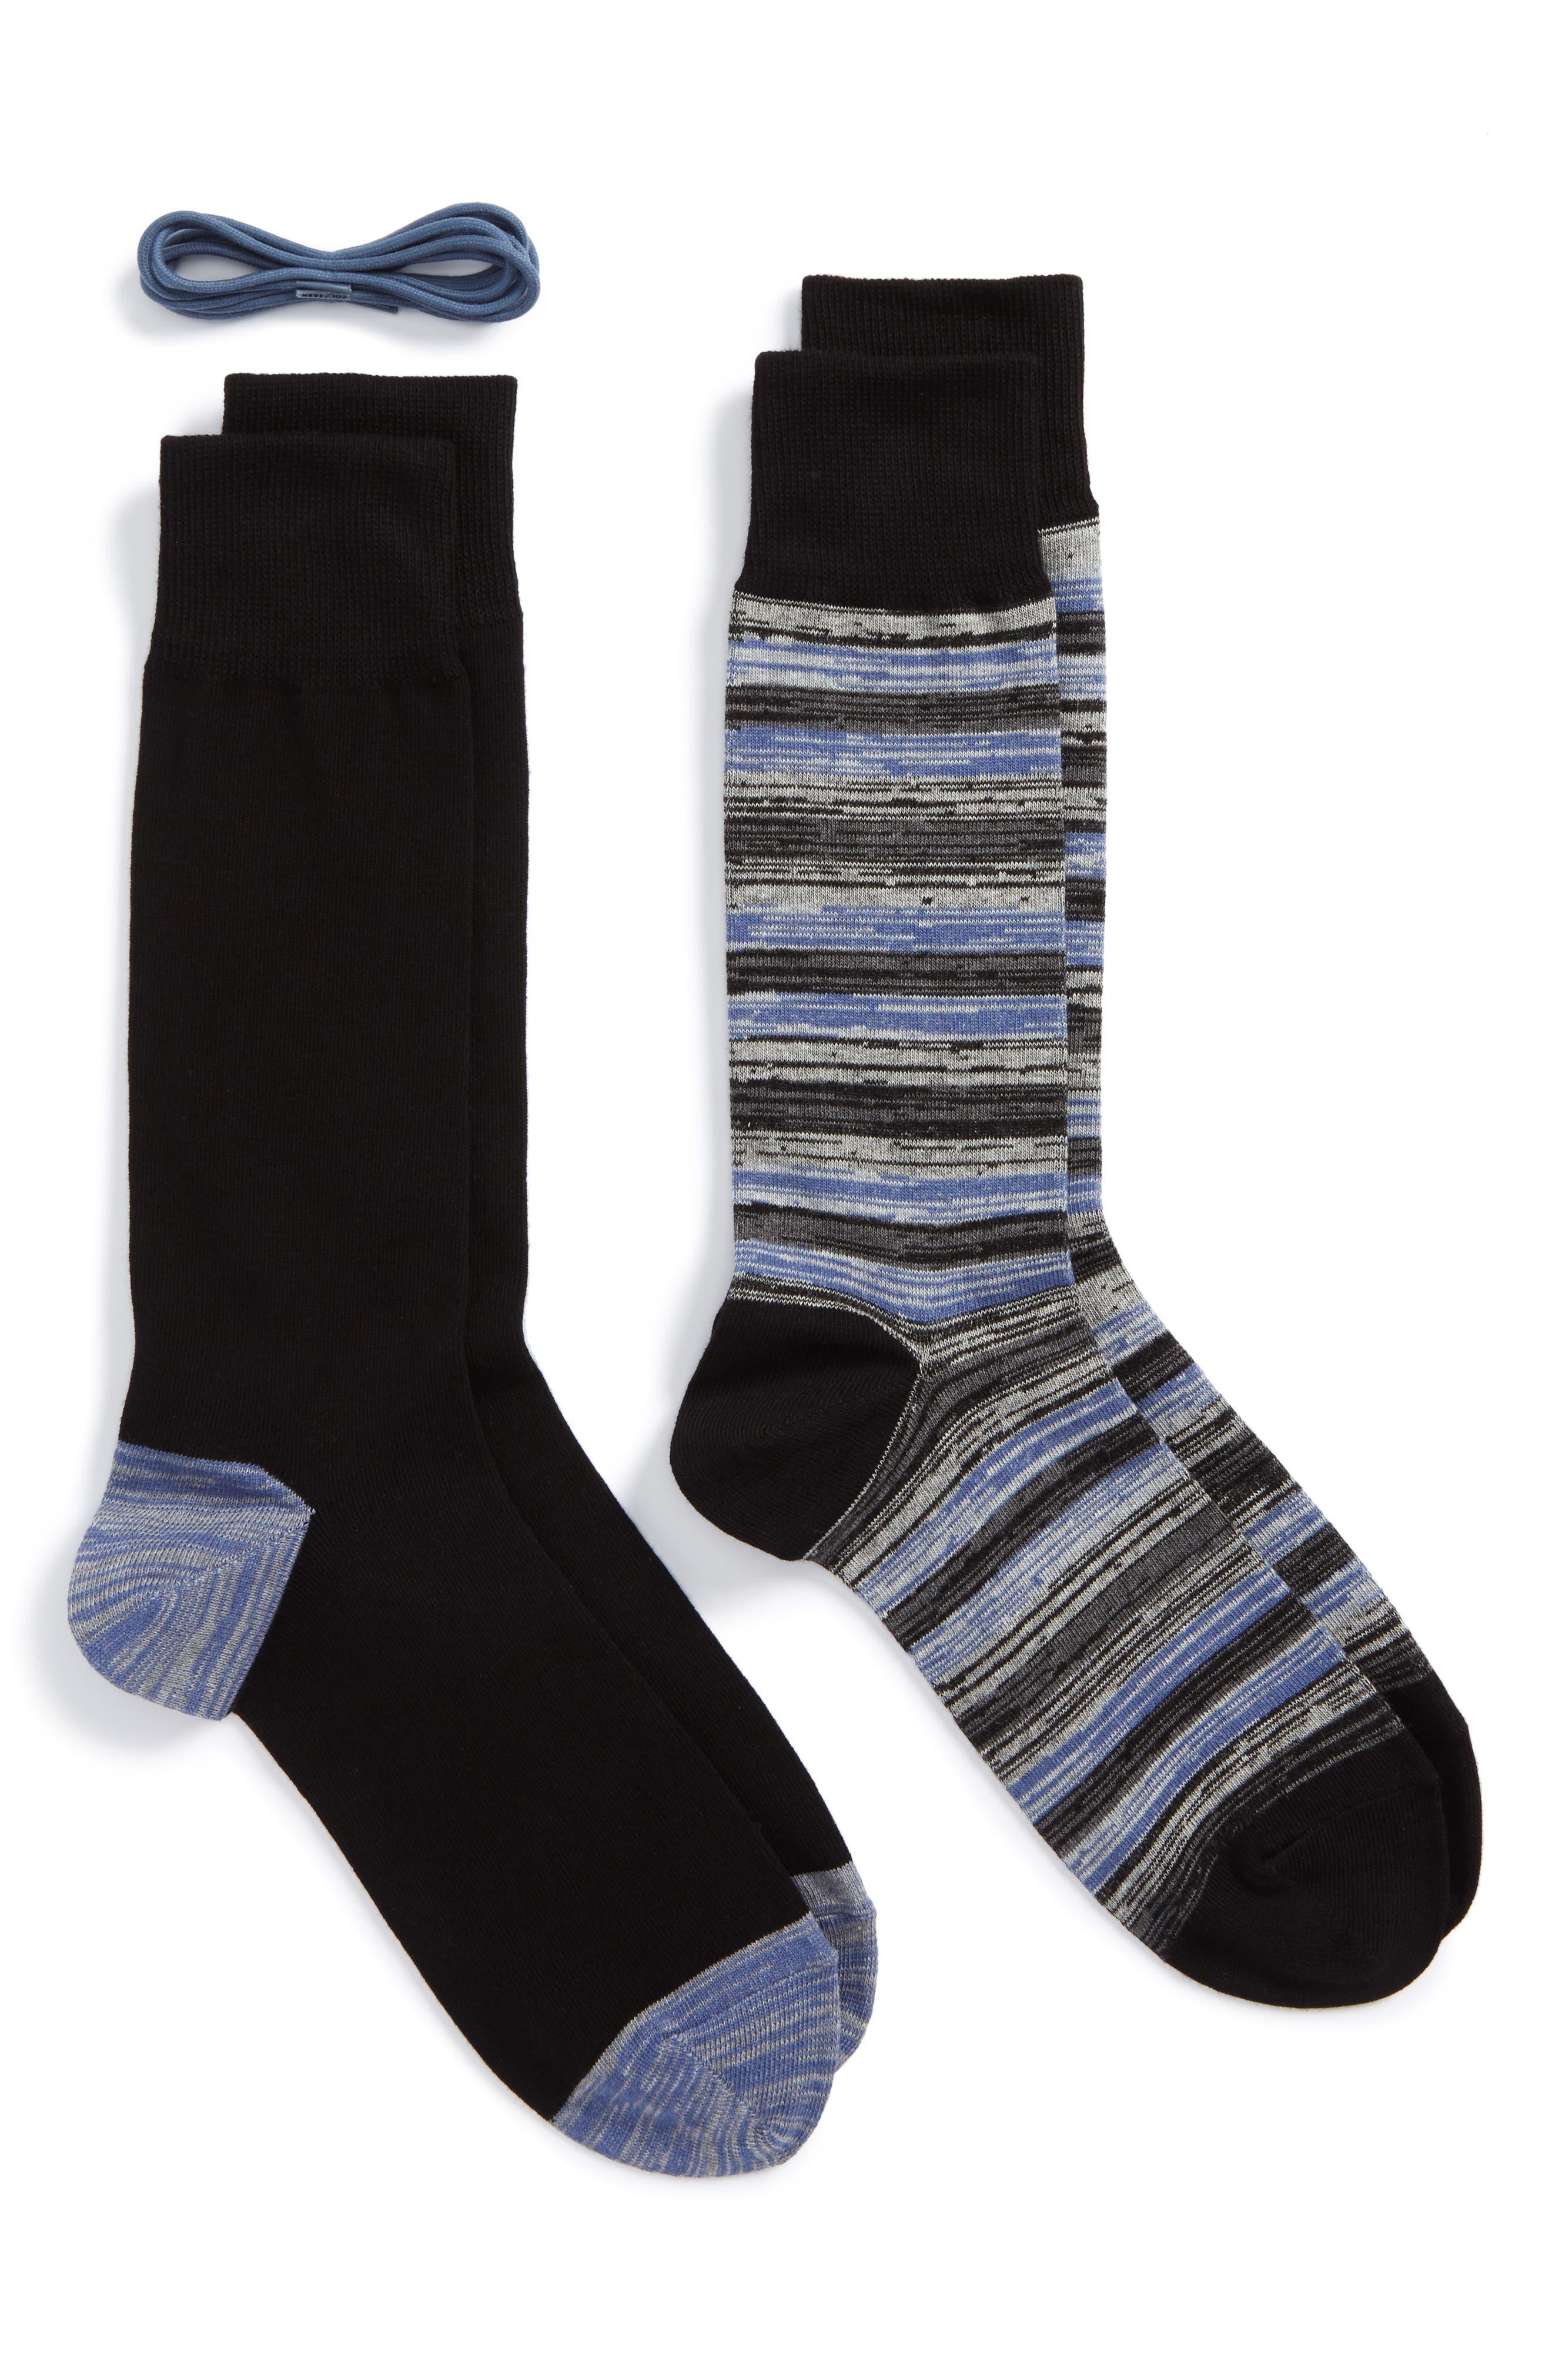 Main Image - Cole Haan 2-Pack Socks & Laces Set ($31.95 Value)